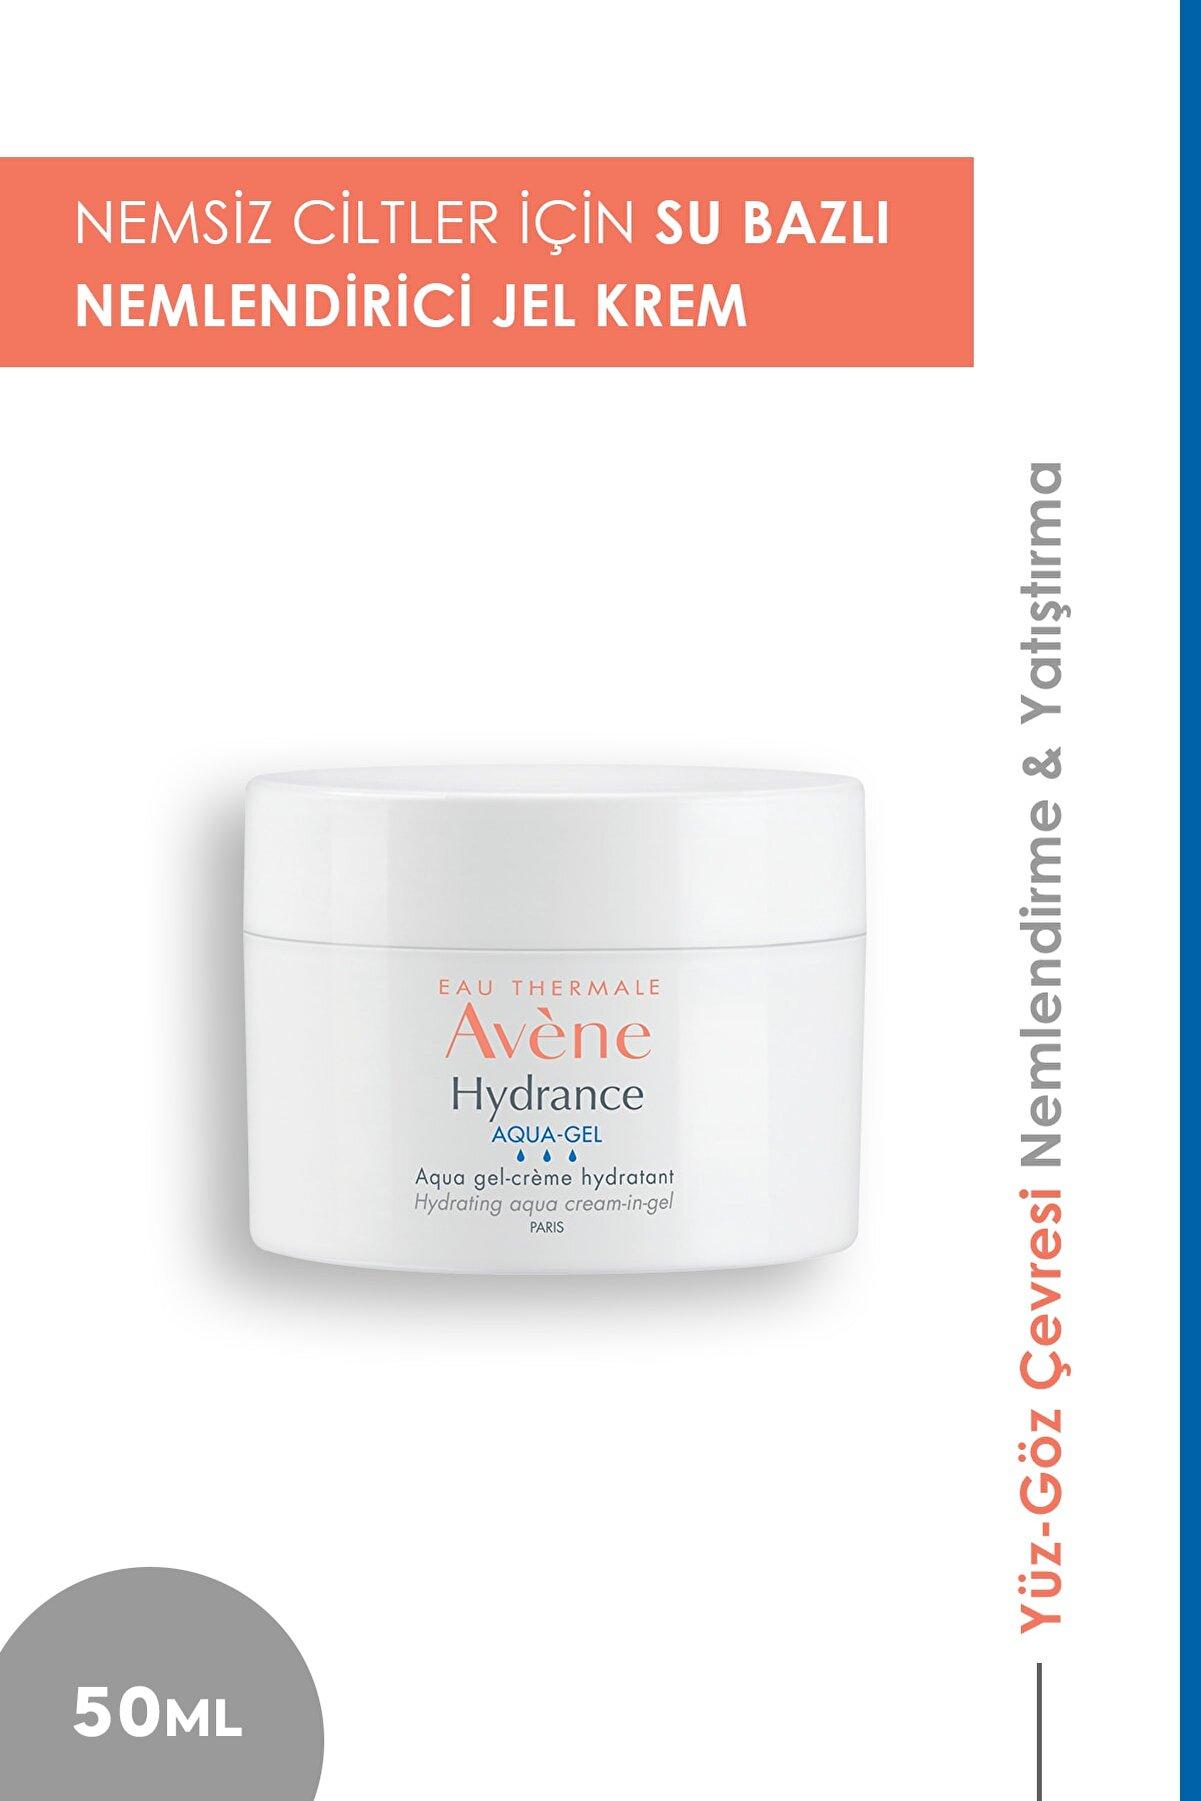 Avene Hydrance Aqua Gel Cream 50ml